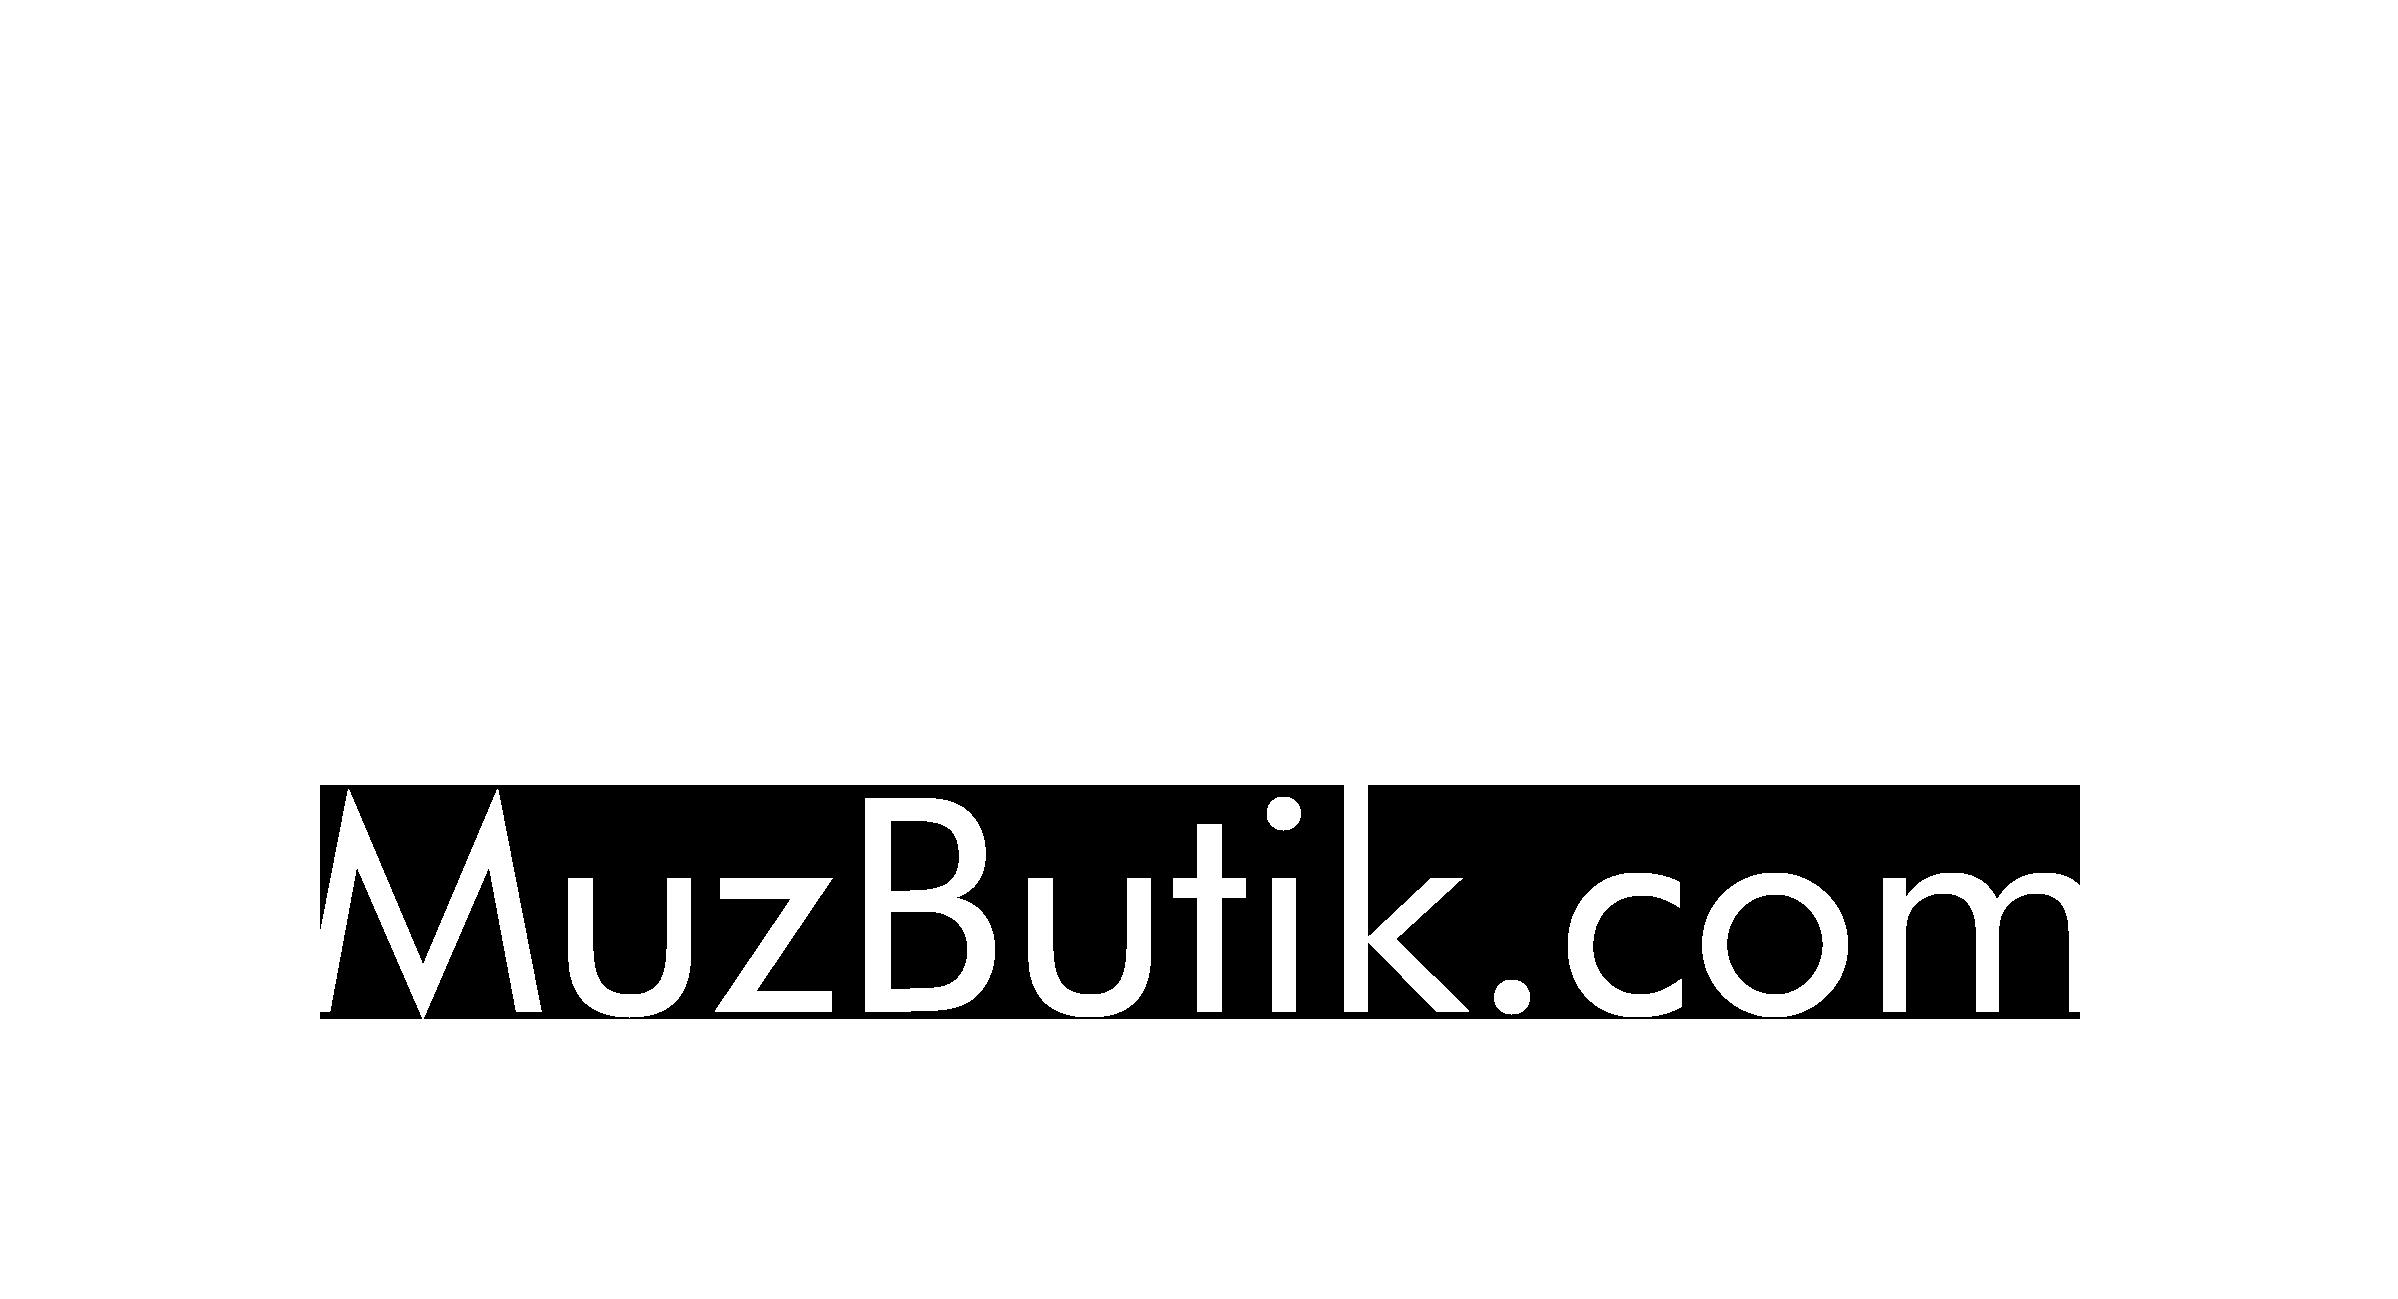 МузБутик